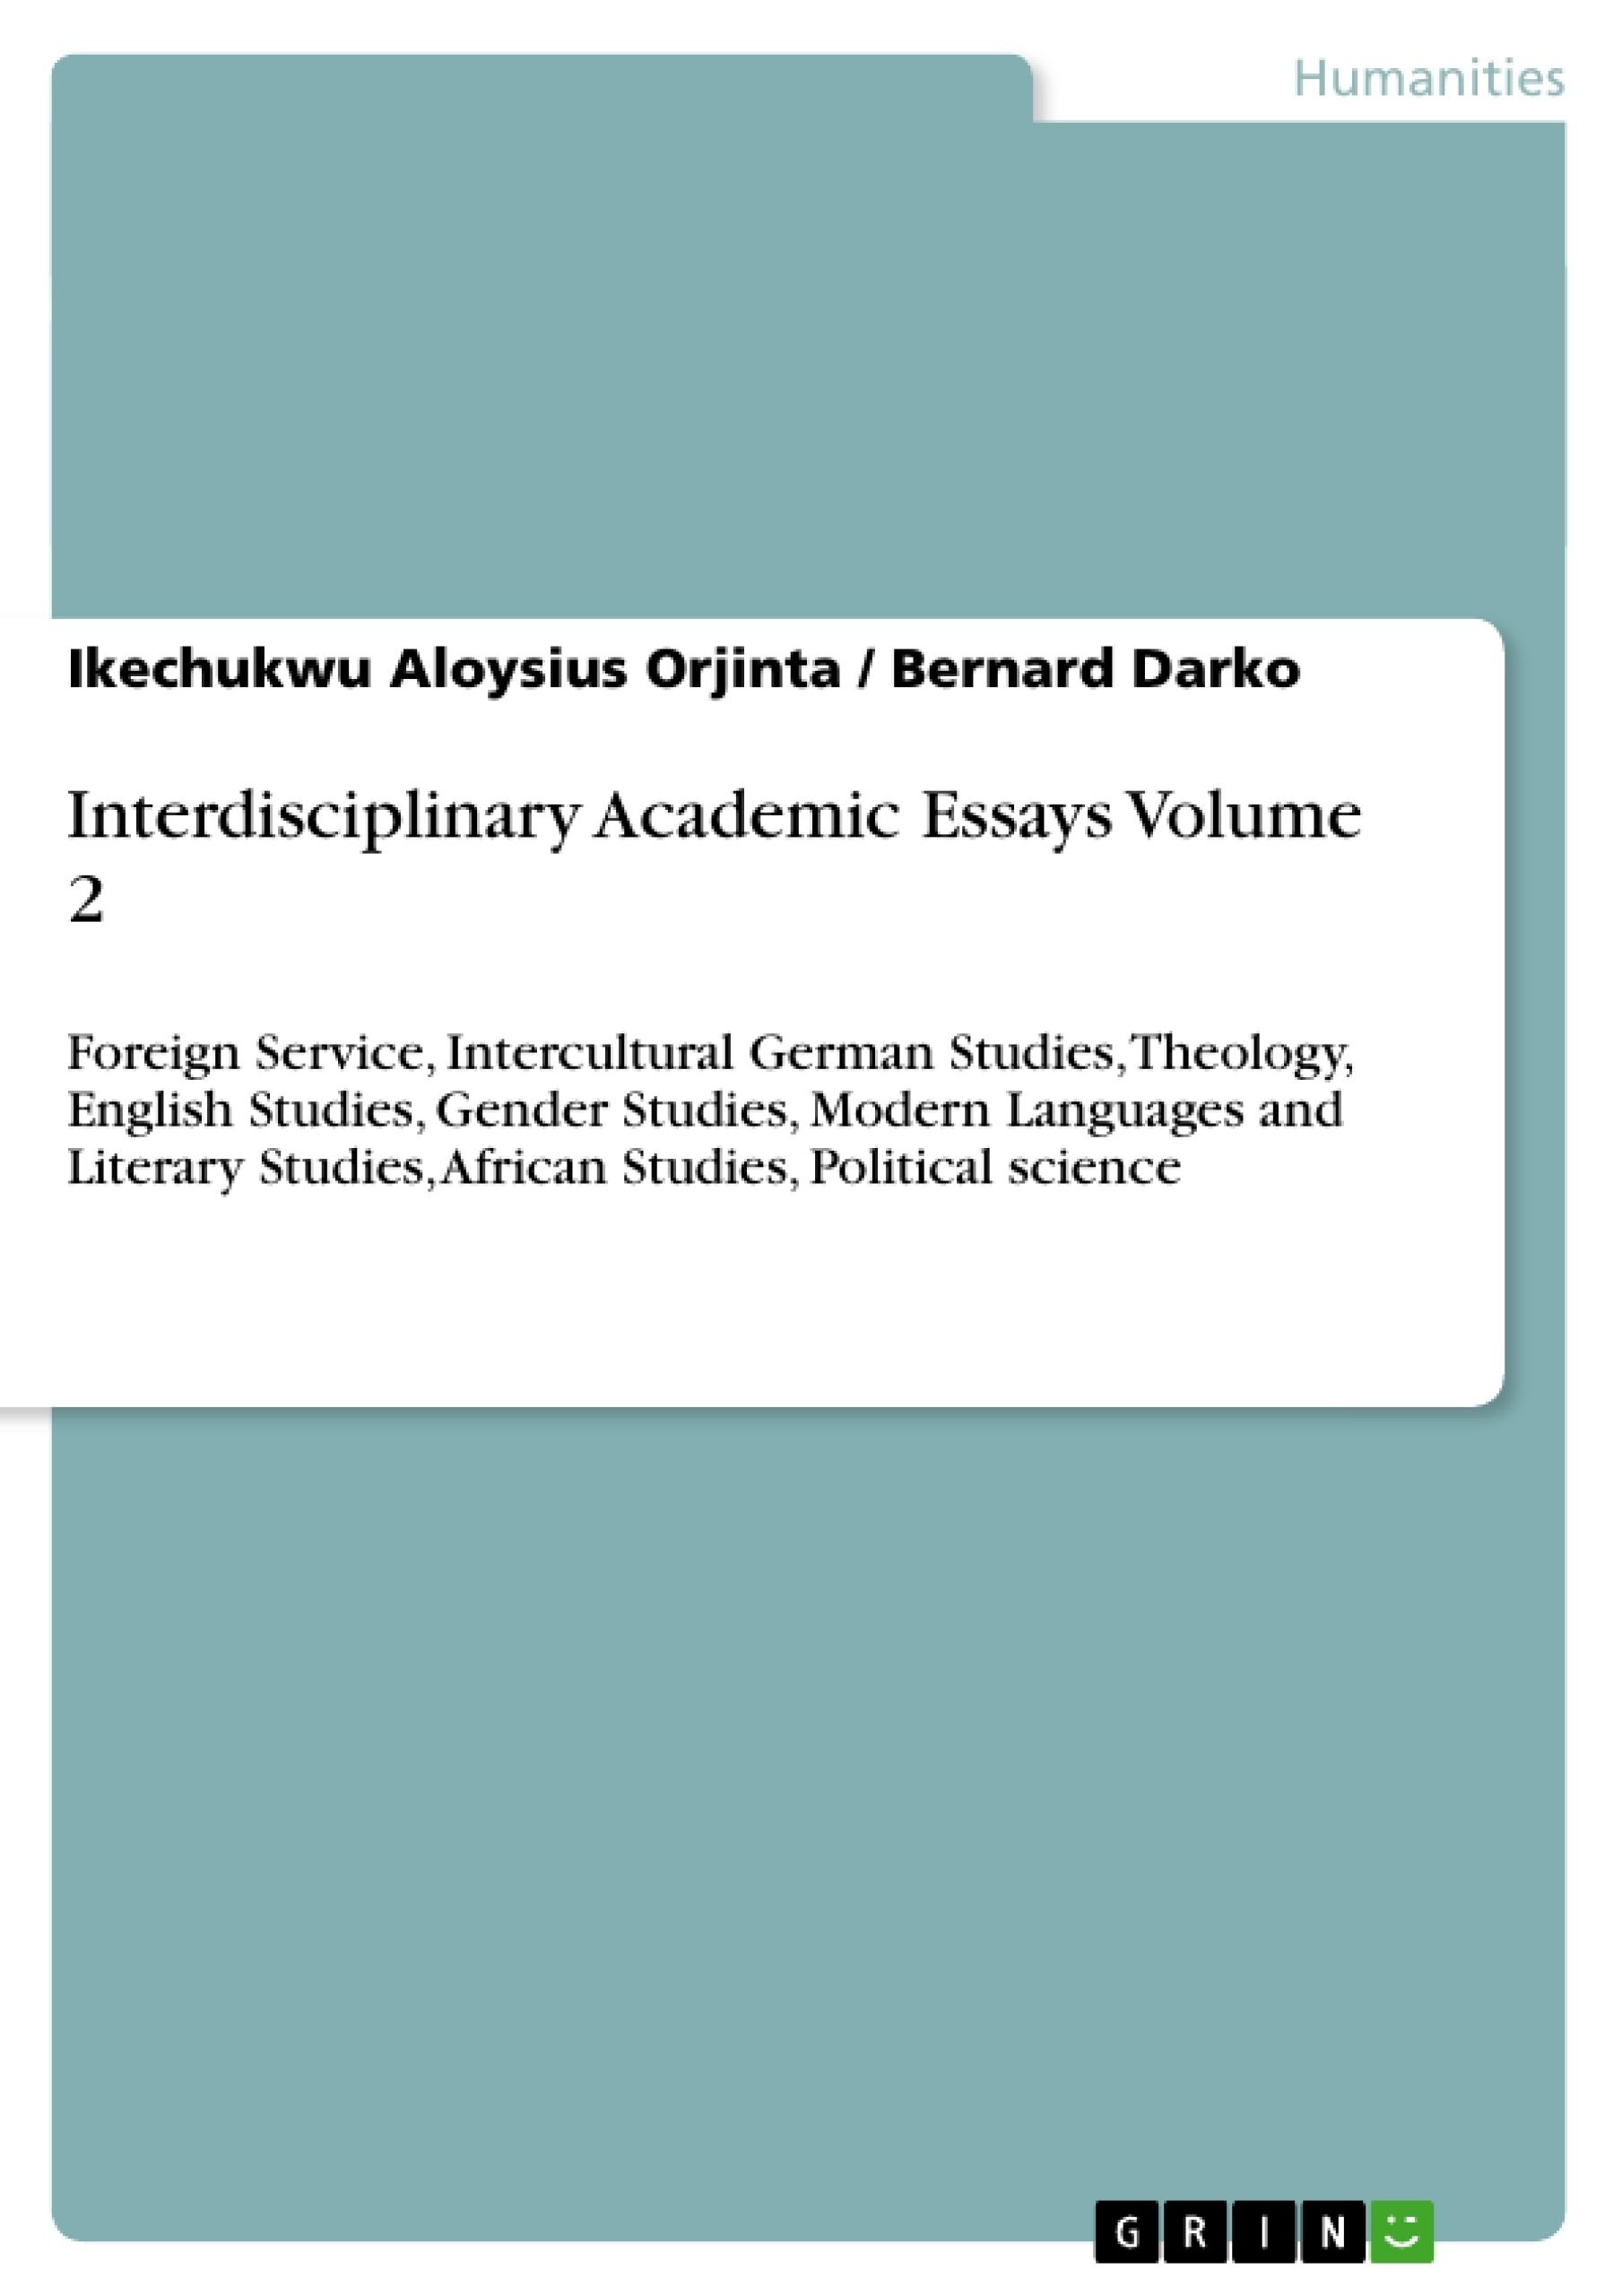 Title: Interdisciplinary Academic Essays Volume 2